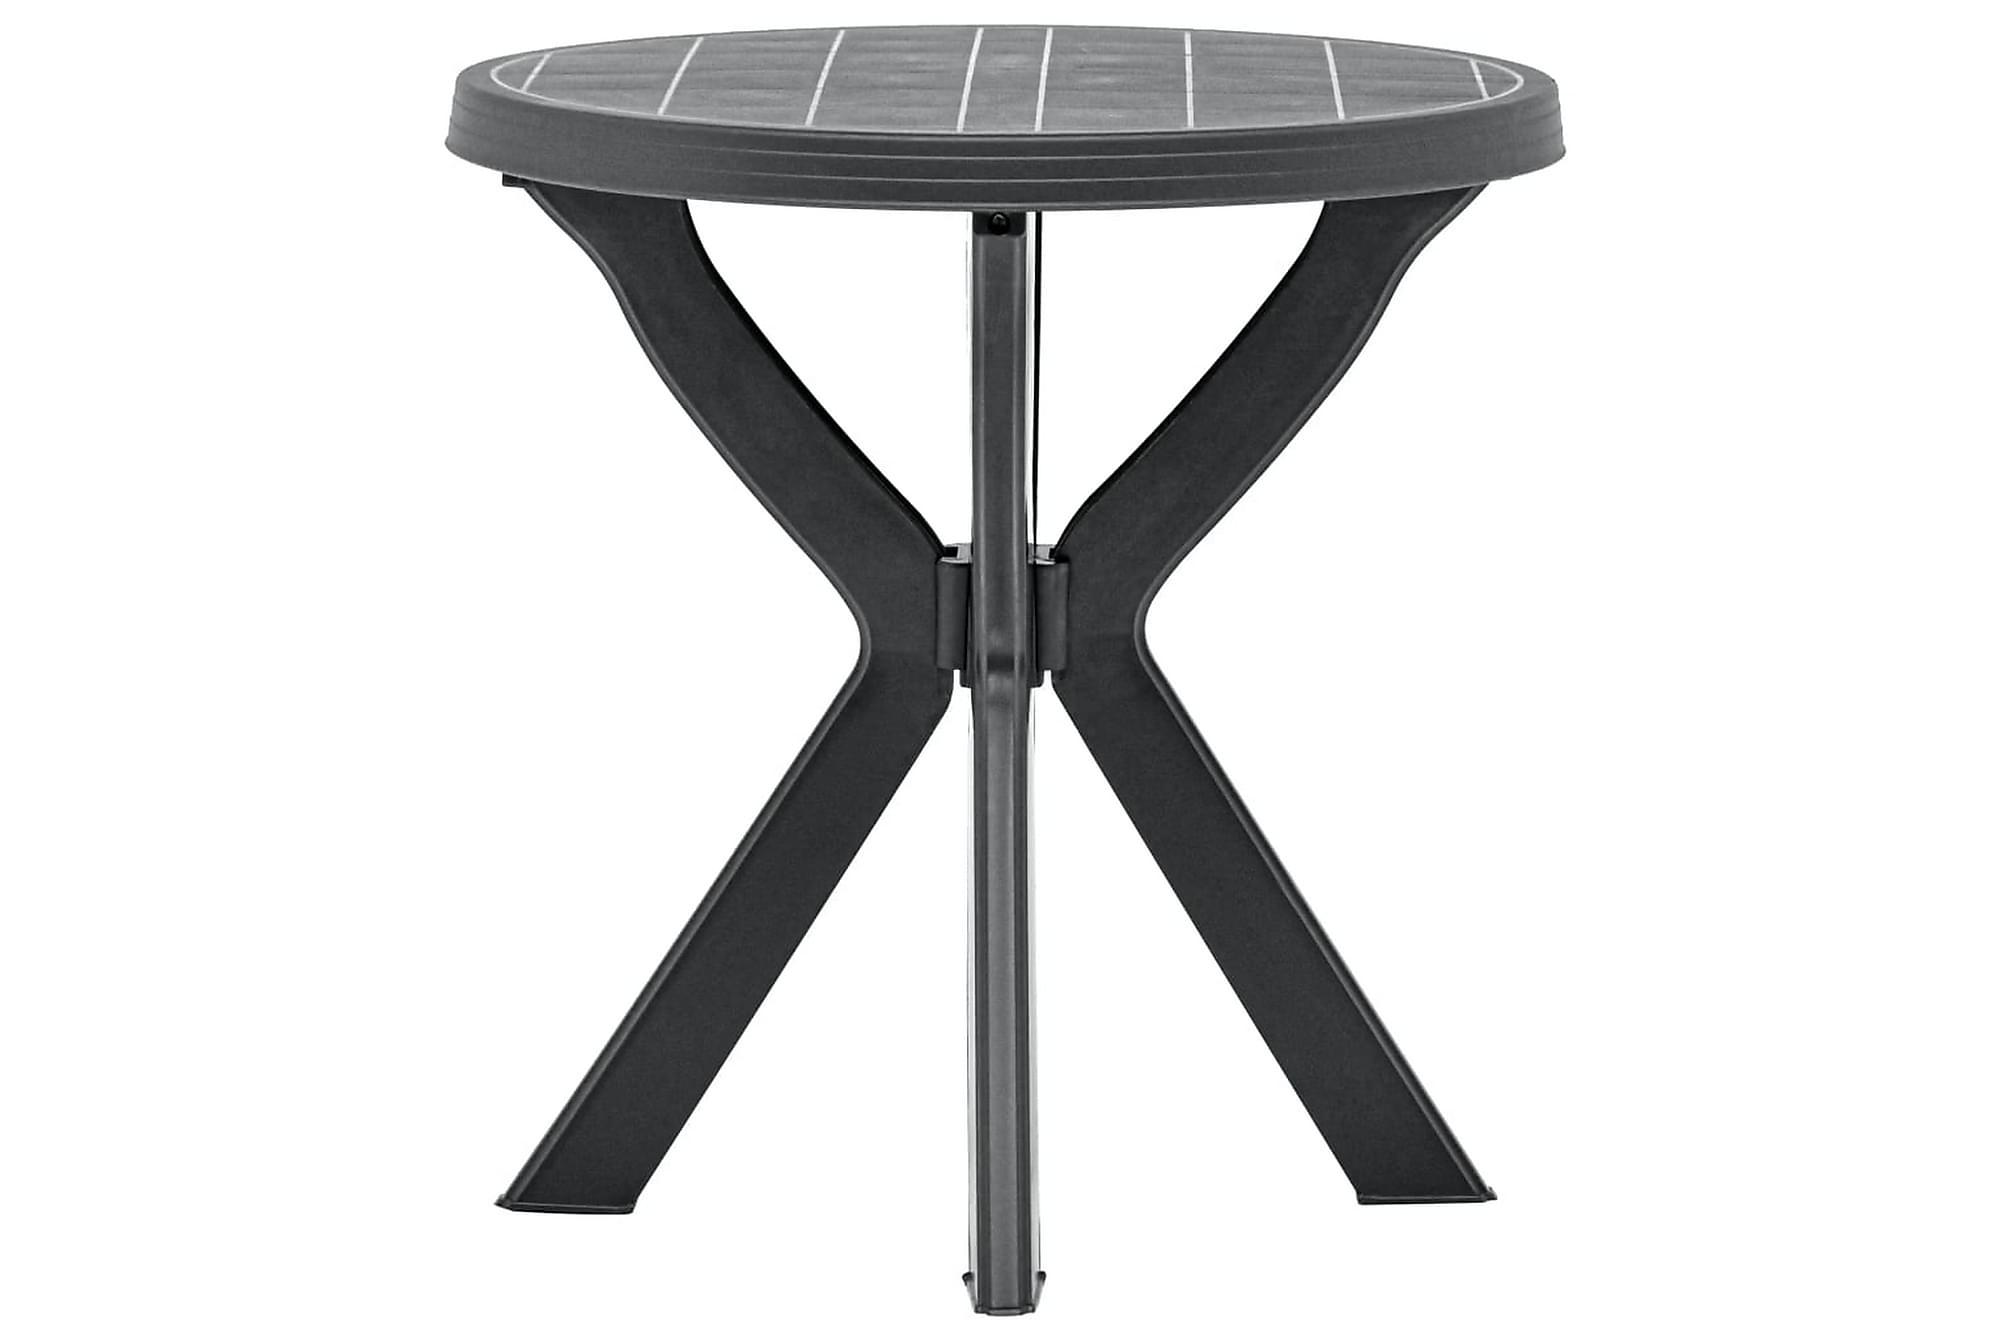 Cafébord antracit Ã?70 cm plast, Cafebord